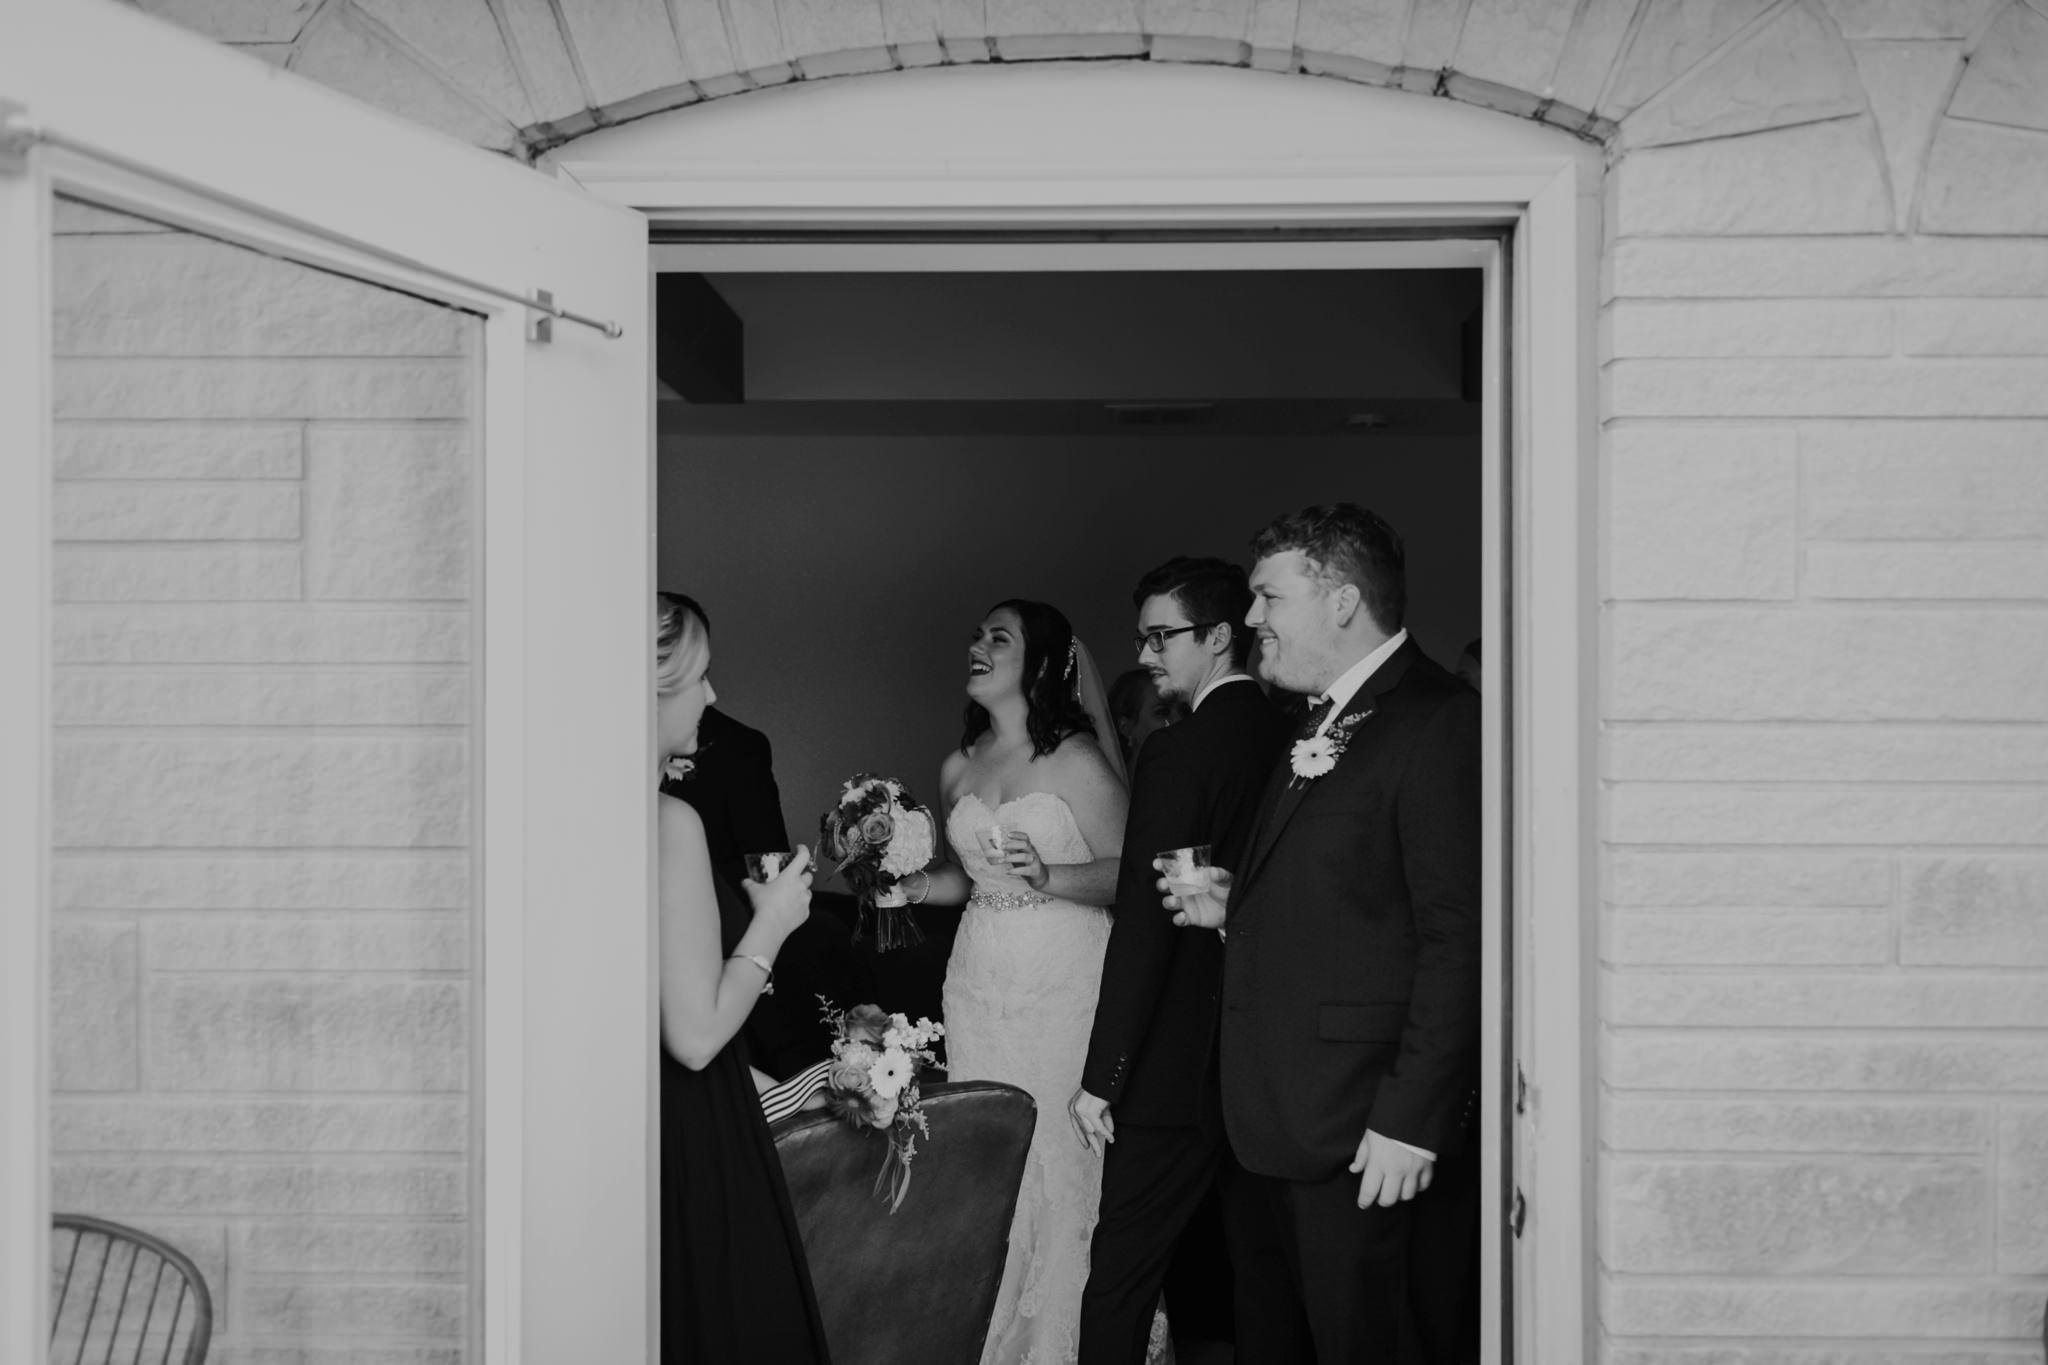 17-09-15 Lindsey and Brandon Wedding Edited-779_WEB.jpg